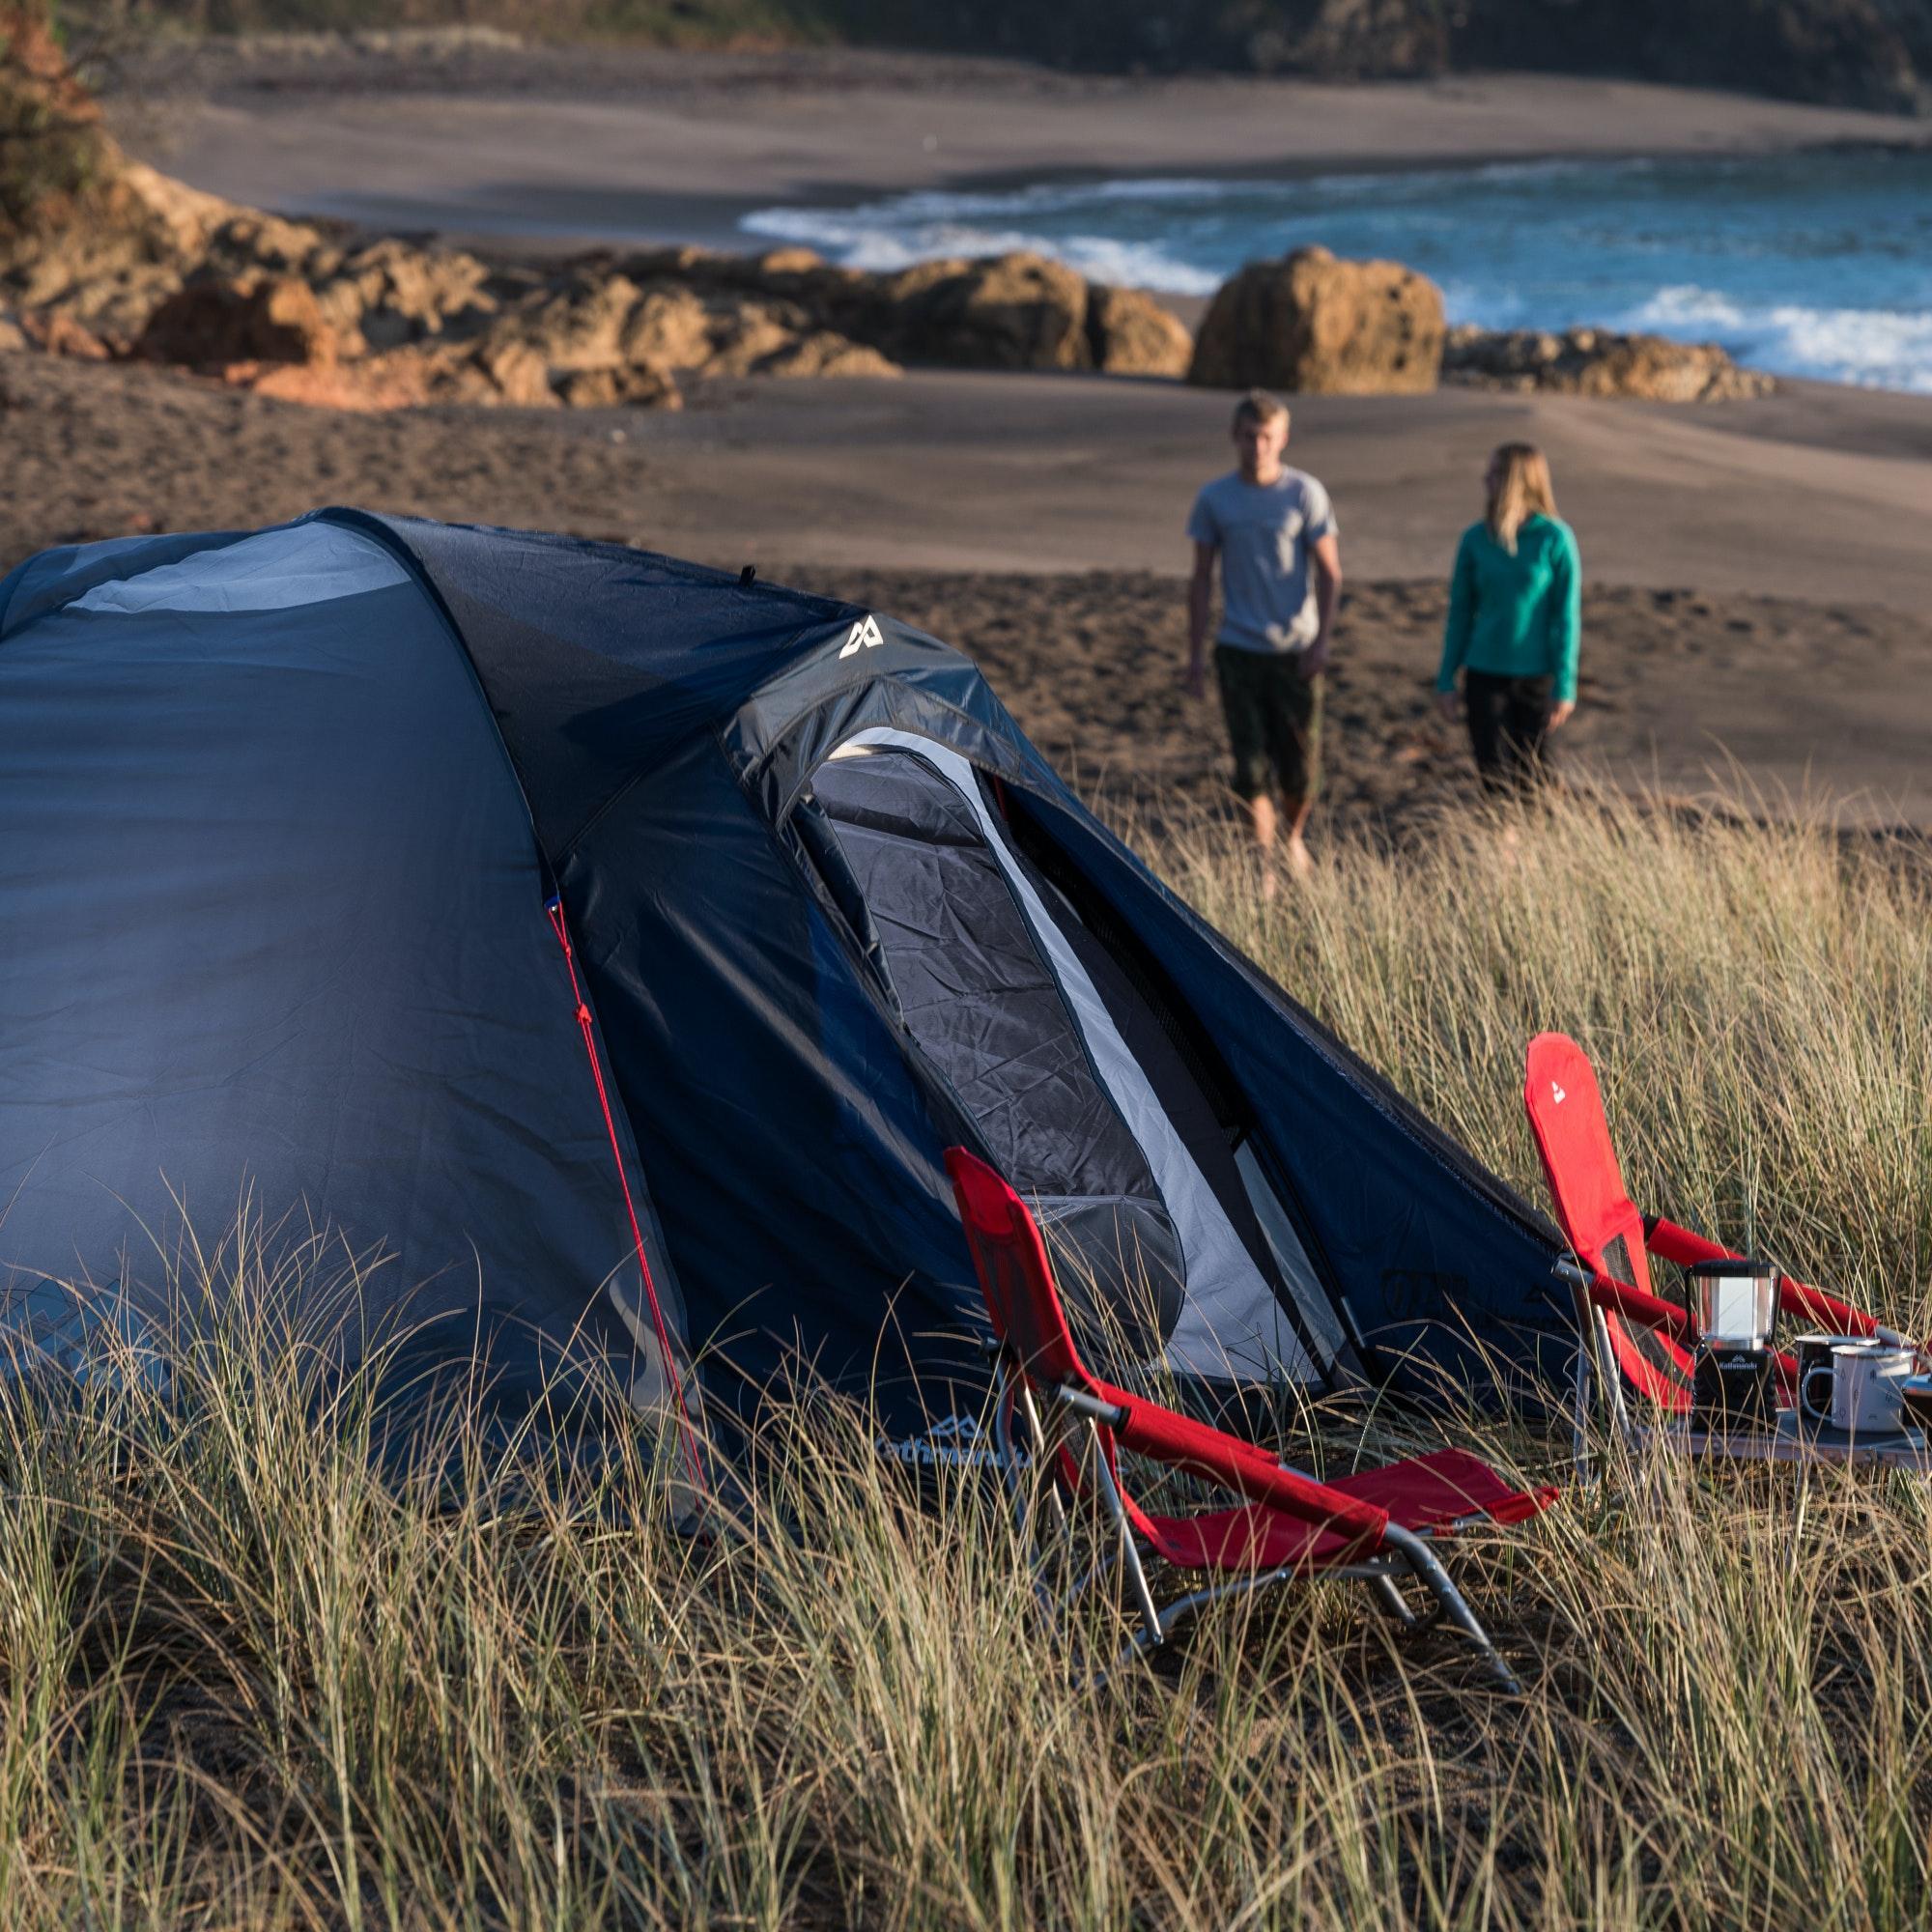 NEW-Kathmandu-Retreat-40-2-Person-Waterproof-Compact-Camping-Hiking-Tent thumbnail 6